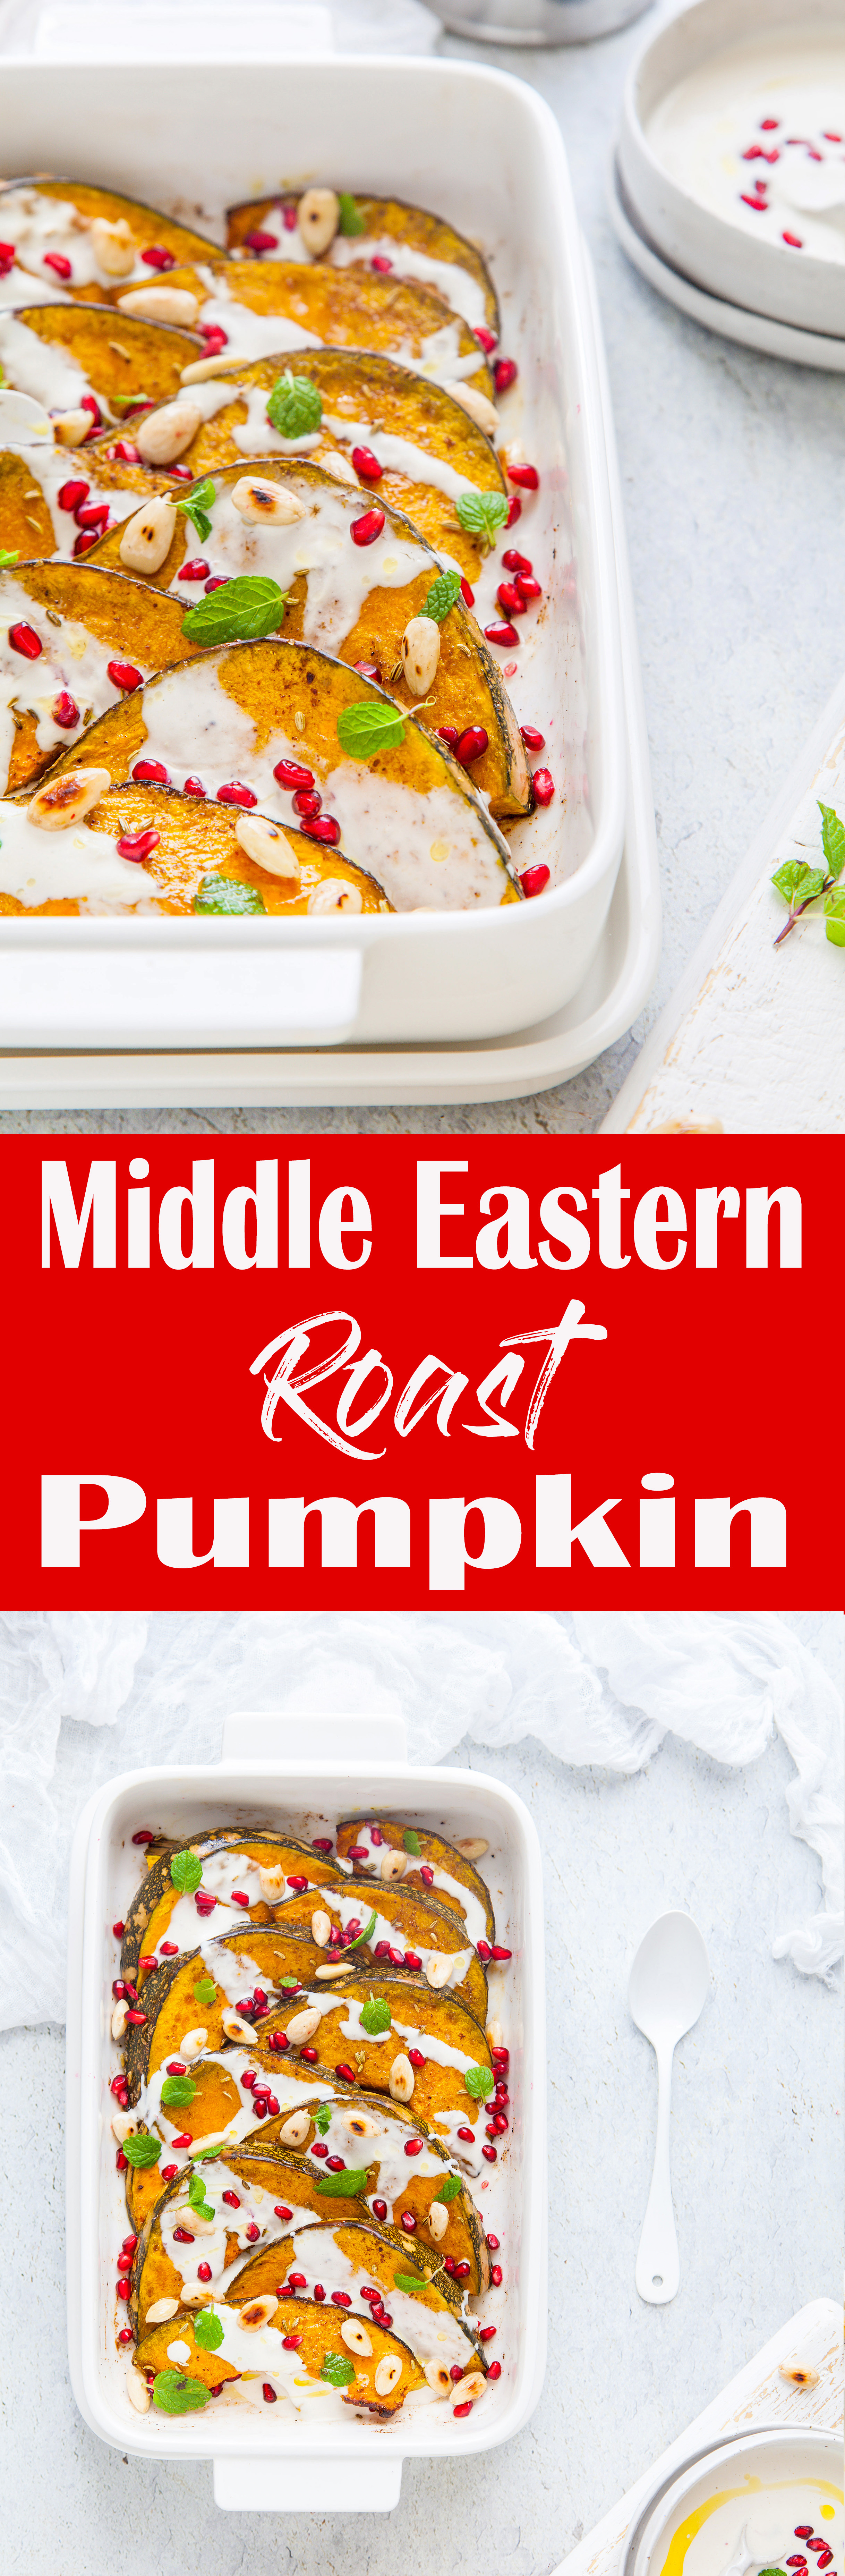 Middle Eastern Roast Pumpkin With Garlic & Yoghurt Tahini Dressing {GF, DF)